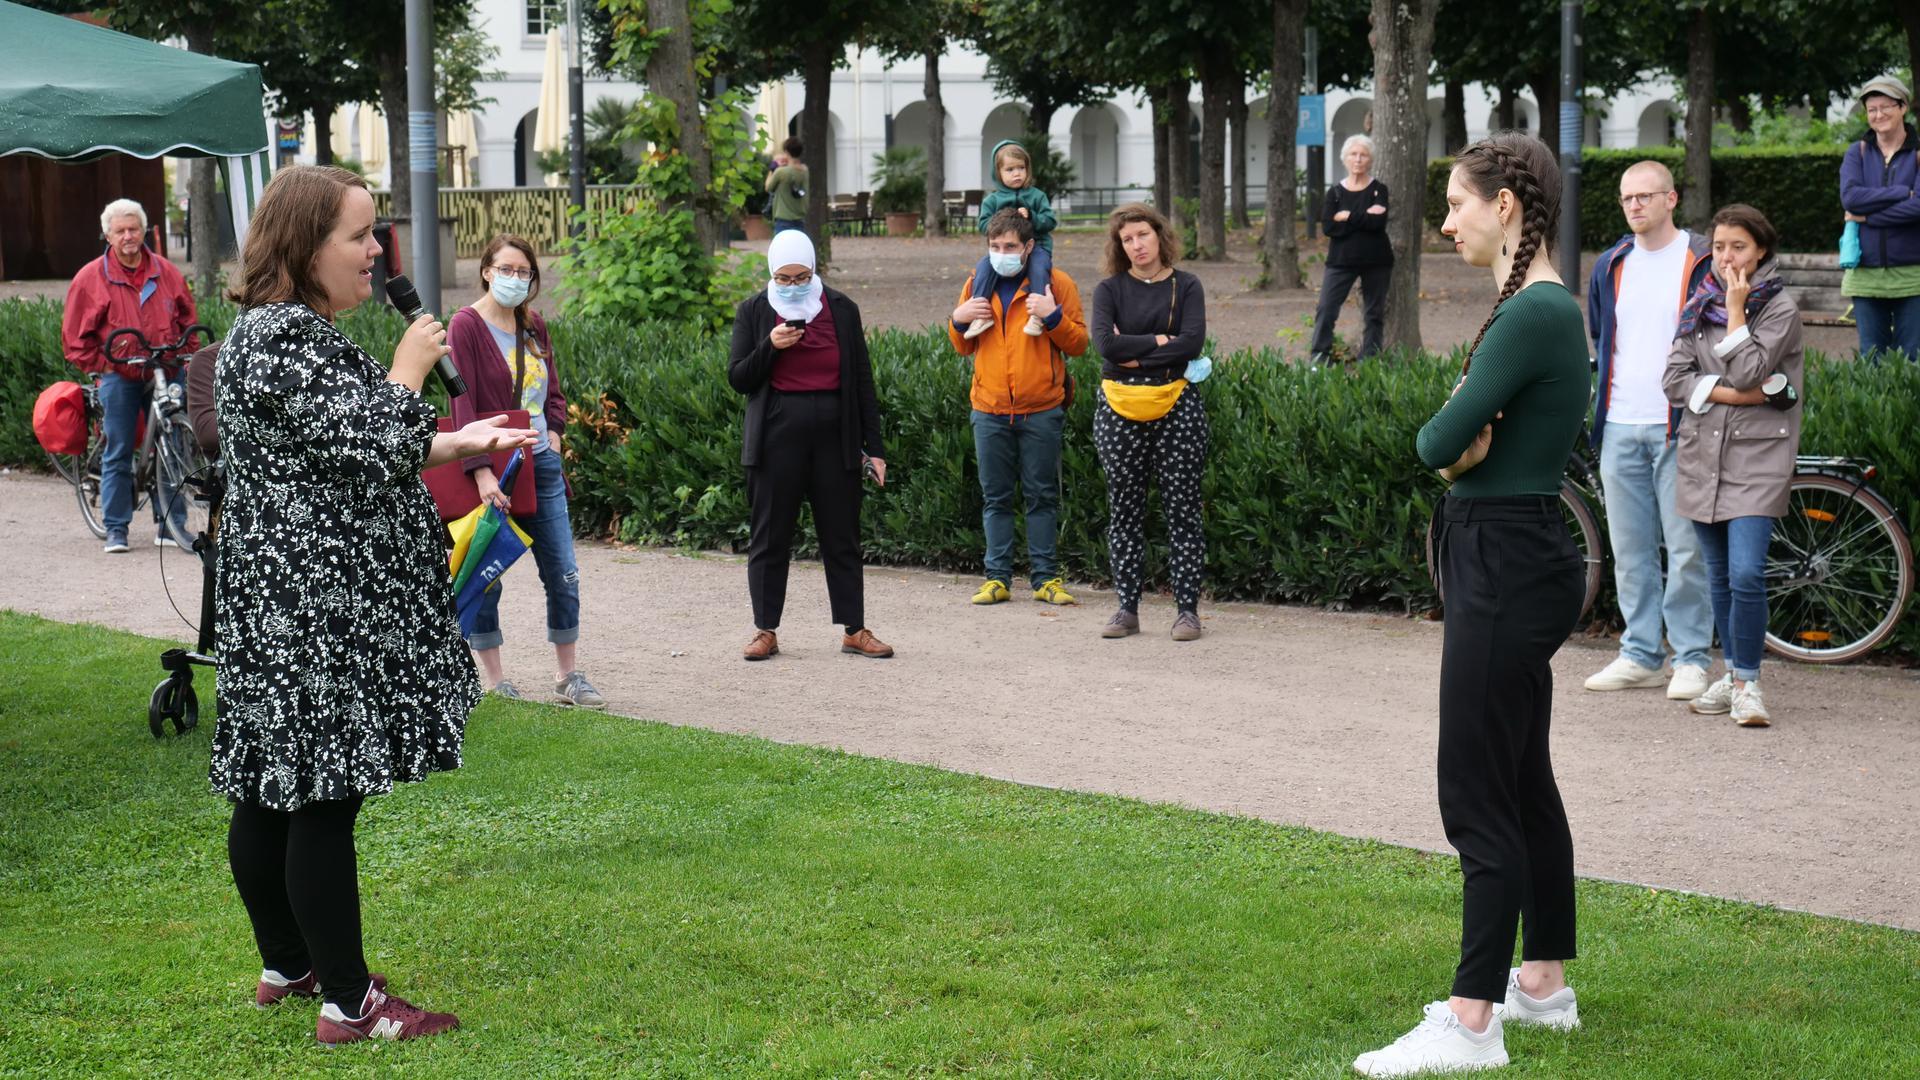 Veranstaltung Gruene vor dem Schloss mit Ricarda Lang (links) und Zoe Mayer (rechts)